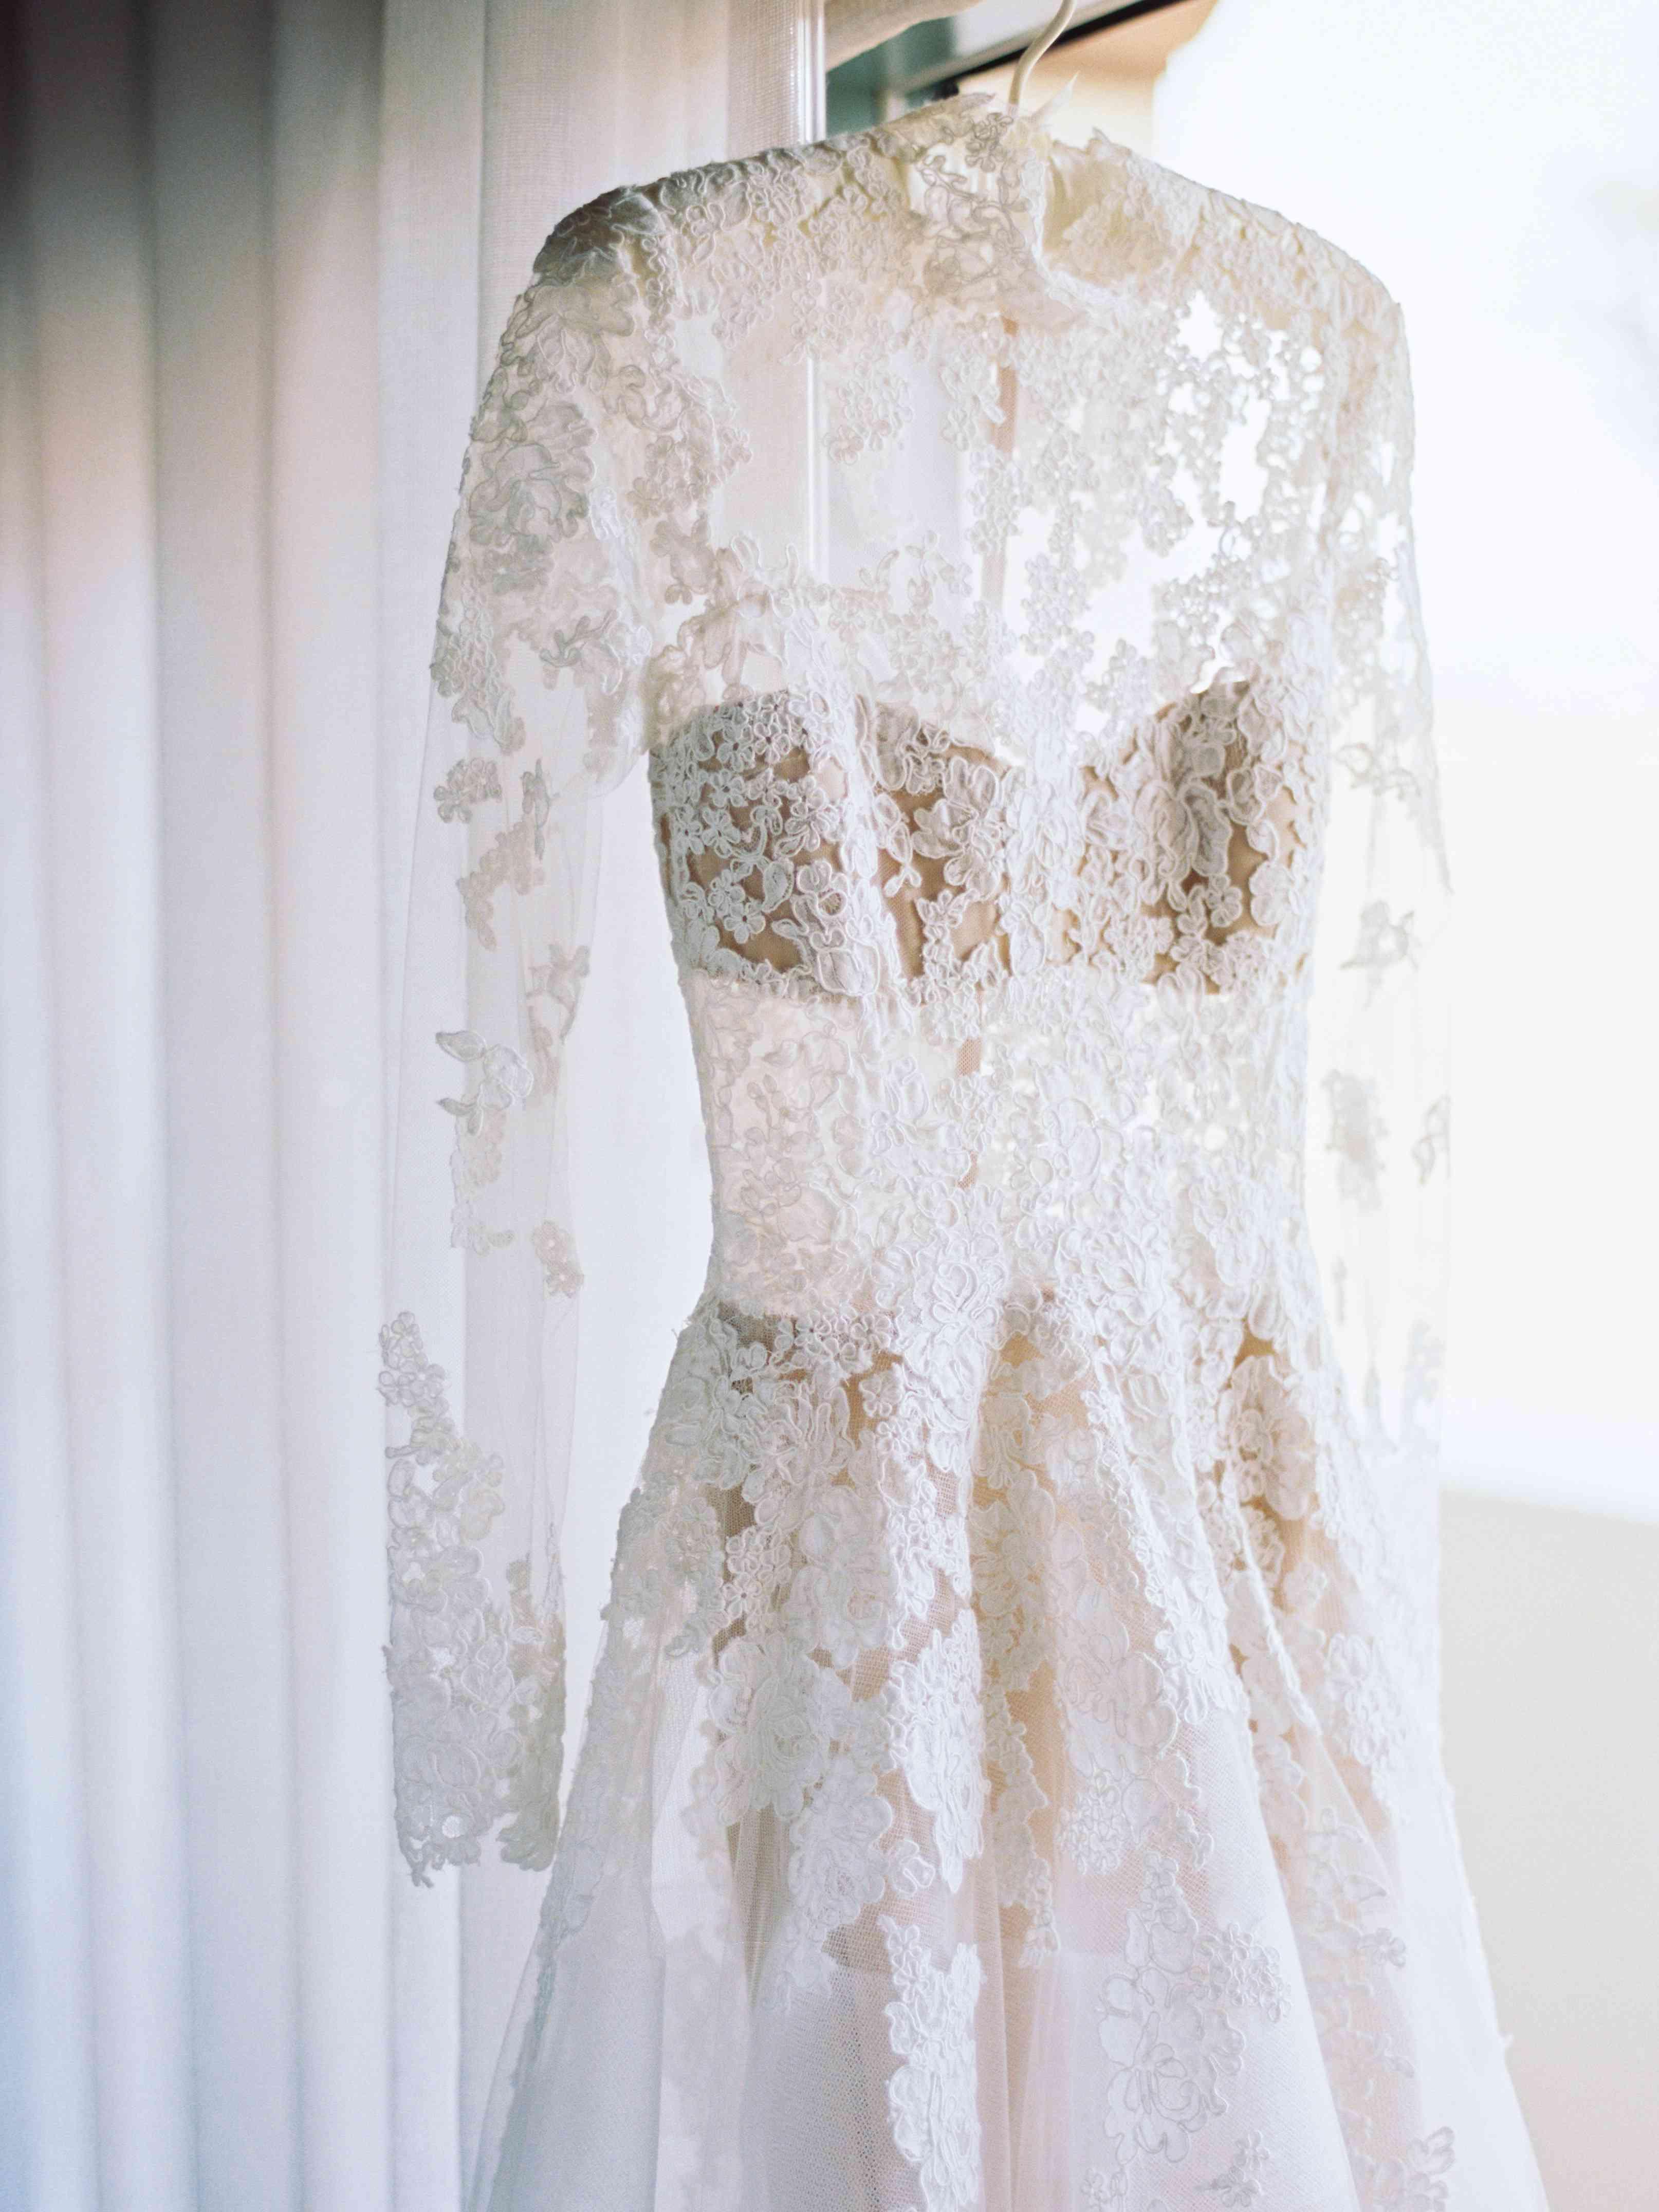 lace wedding dress hanging